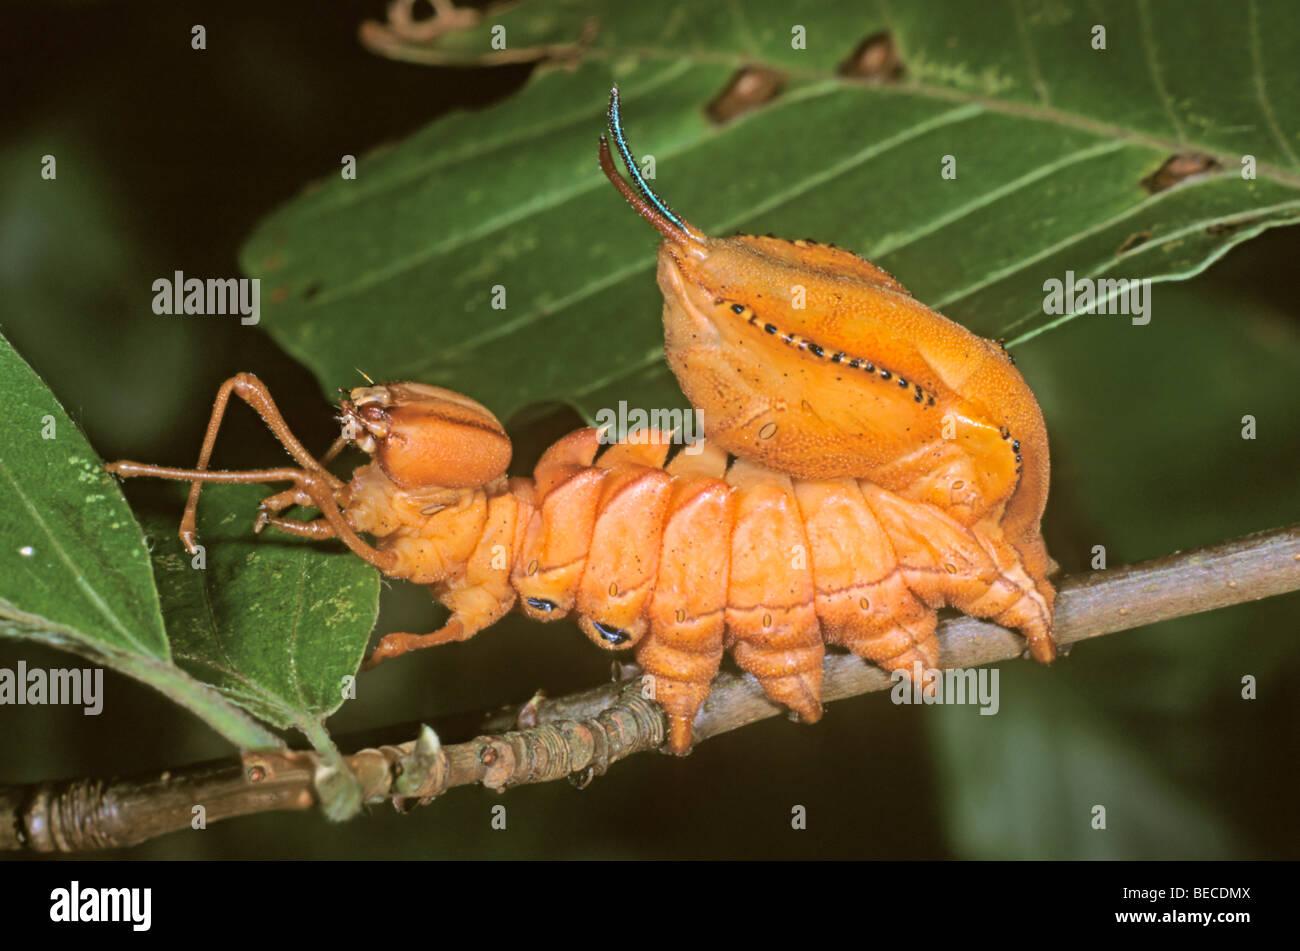 Lobster Moth (Stauropus fagi), caterpillar on twig of a beech tree - Stock Image